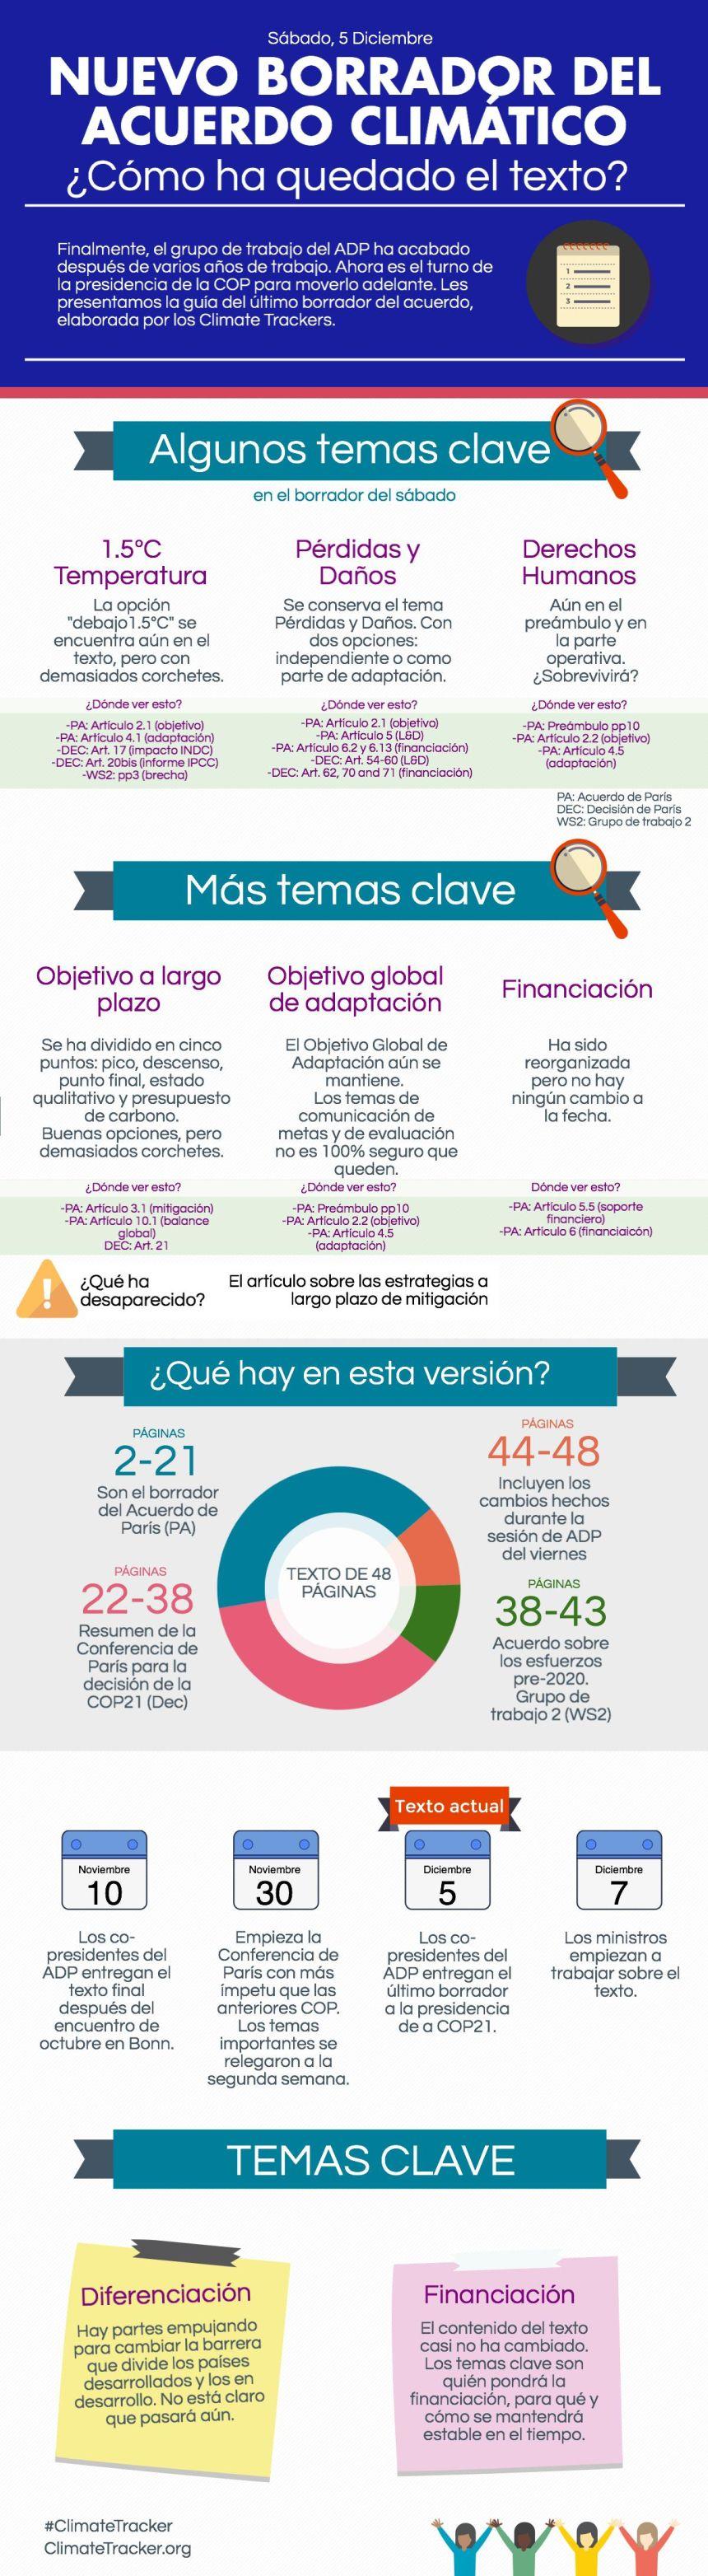 borrador-acuerdo-cimatico-cop21-infografia